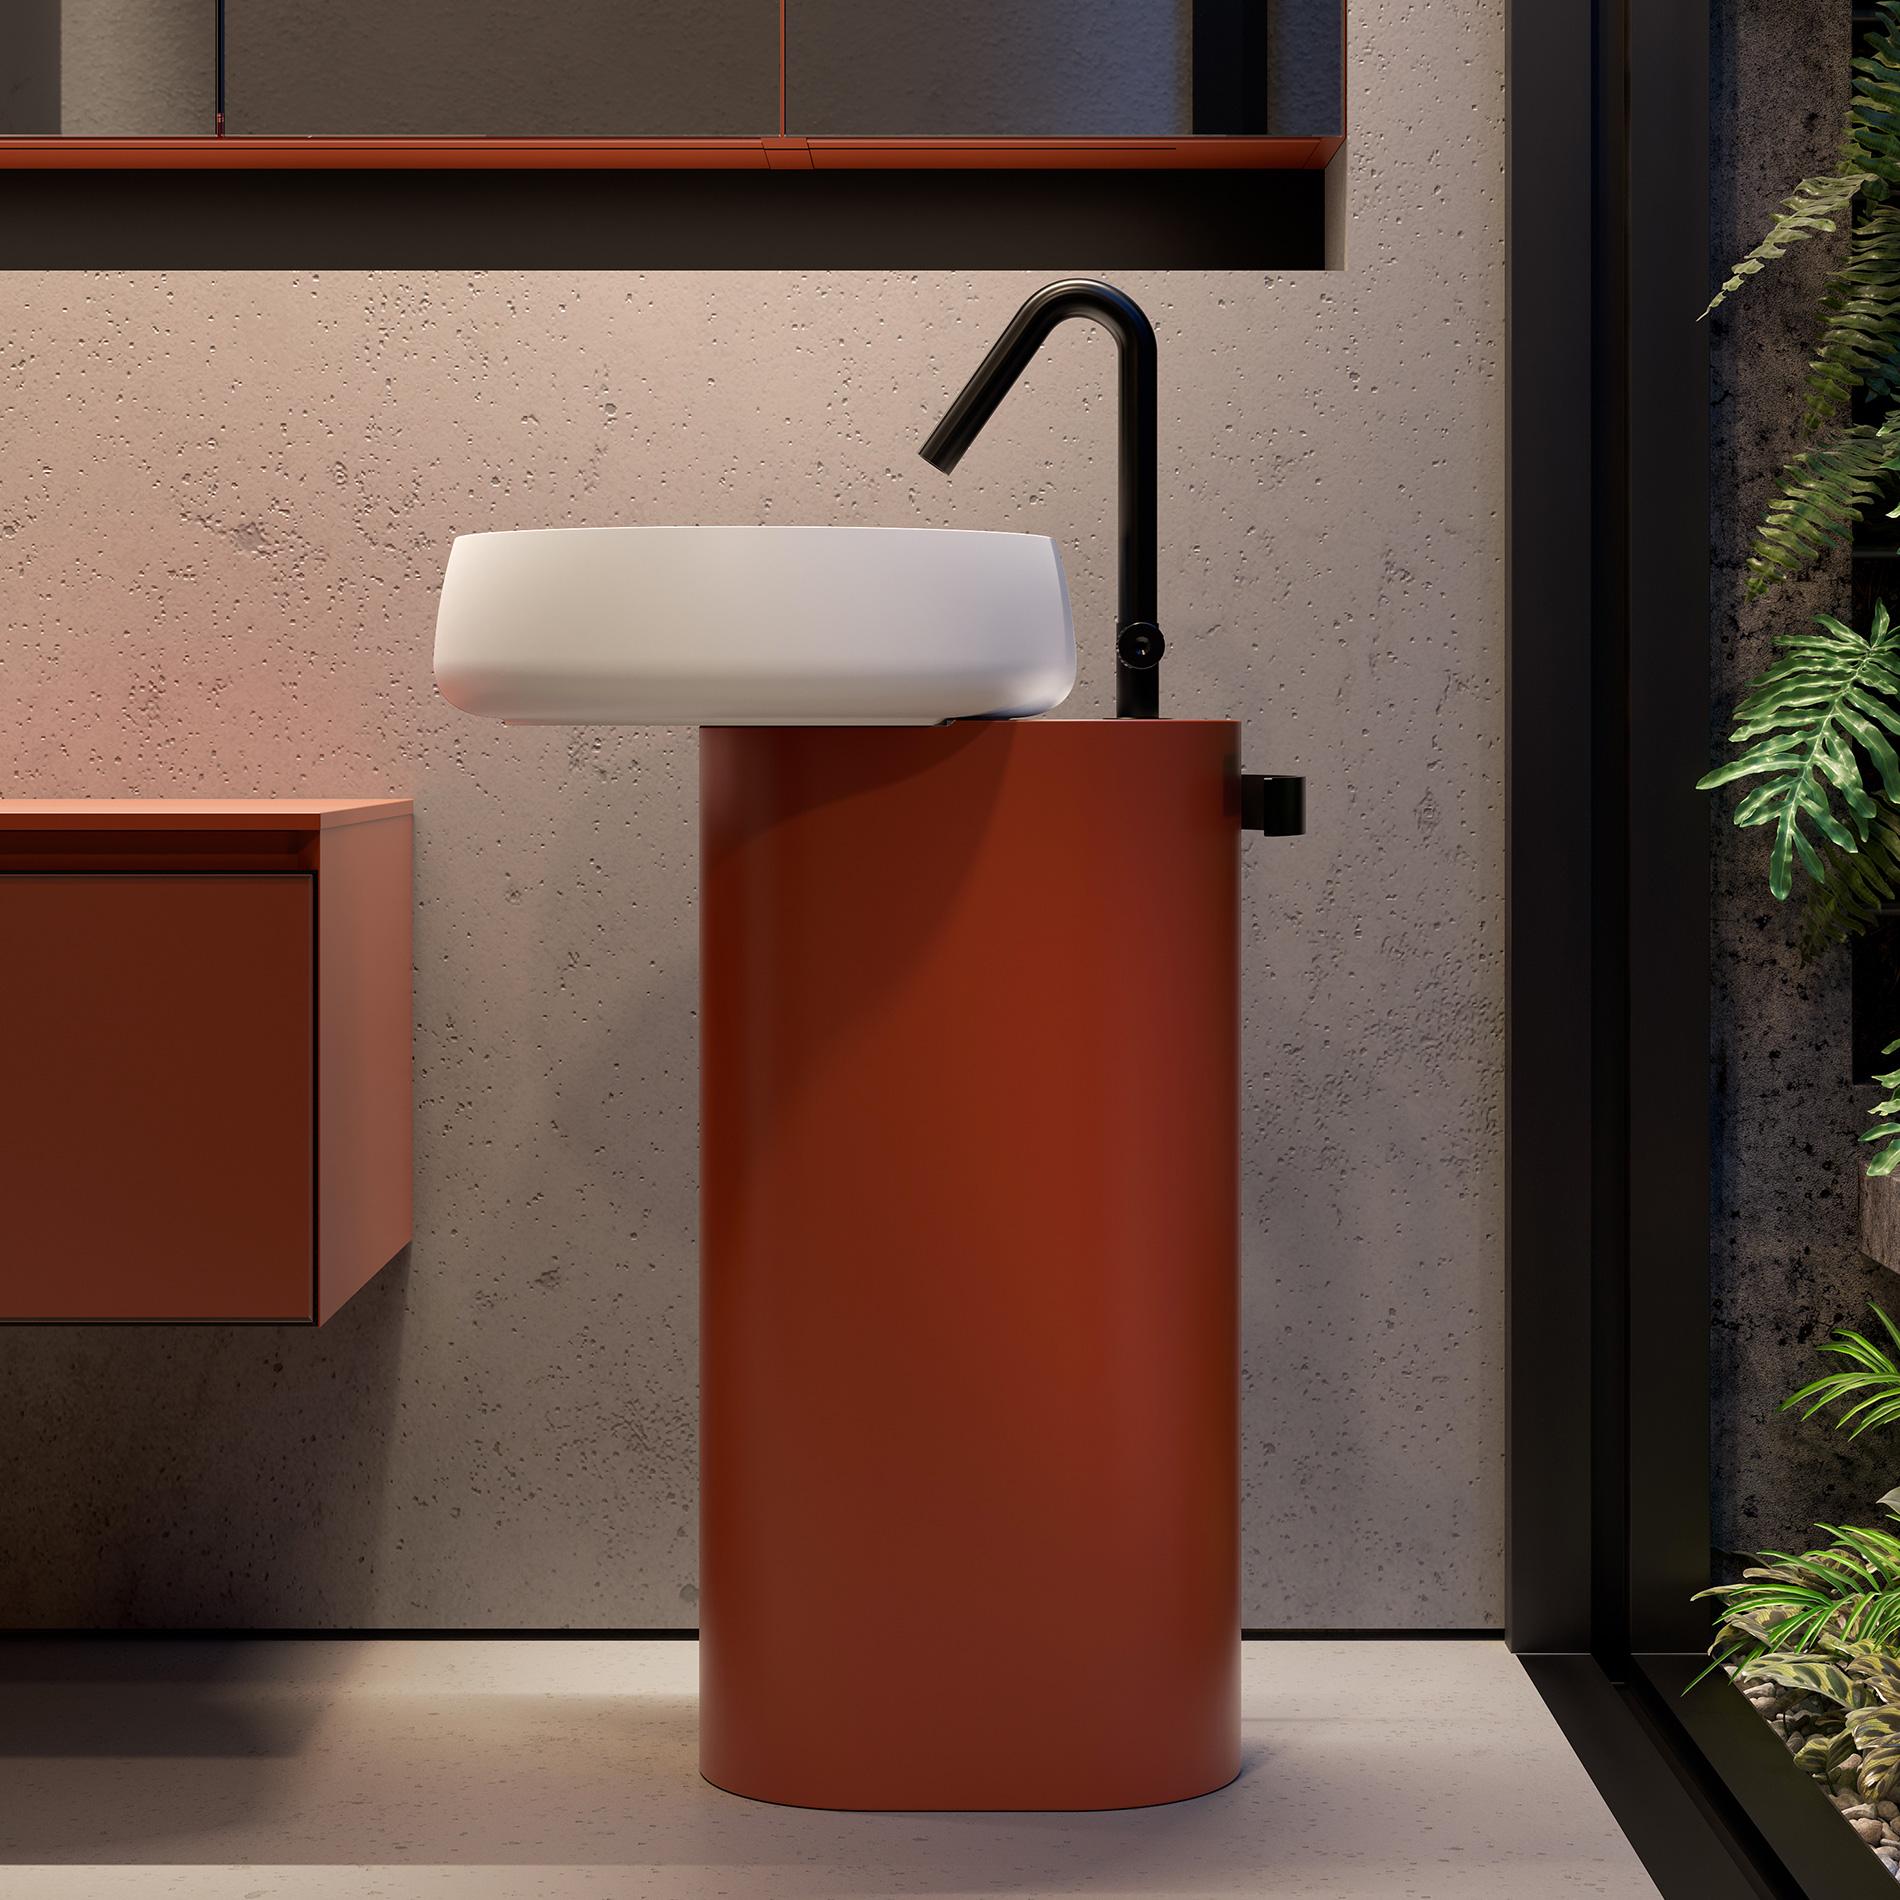 Nicos-International-home-products-Idea-Group-washbasins-2